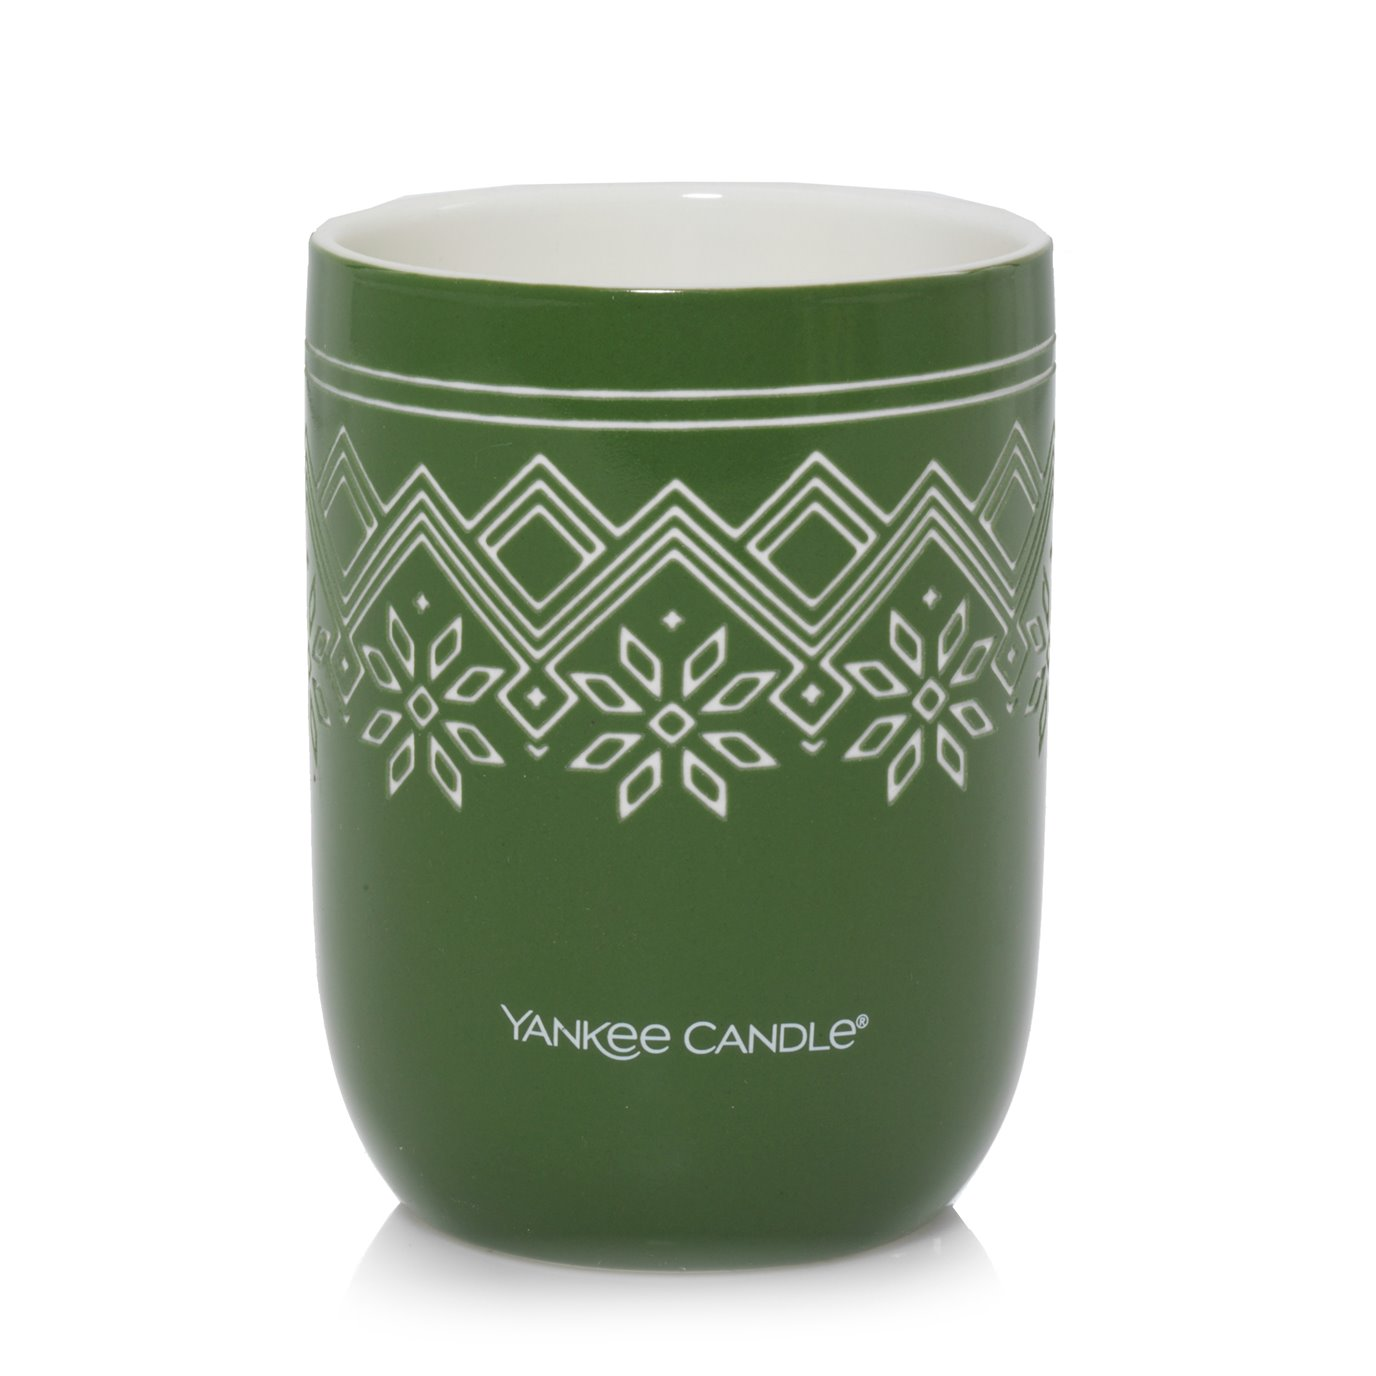 Yankee Candle Balsam & Cedar Nordic Design Ceramic Filled Candle